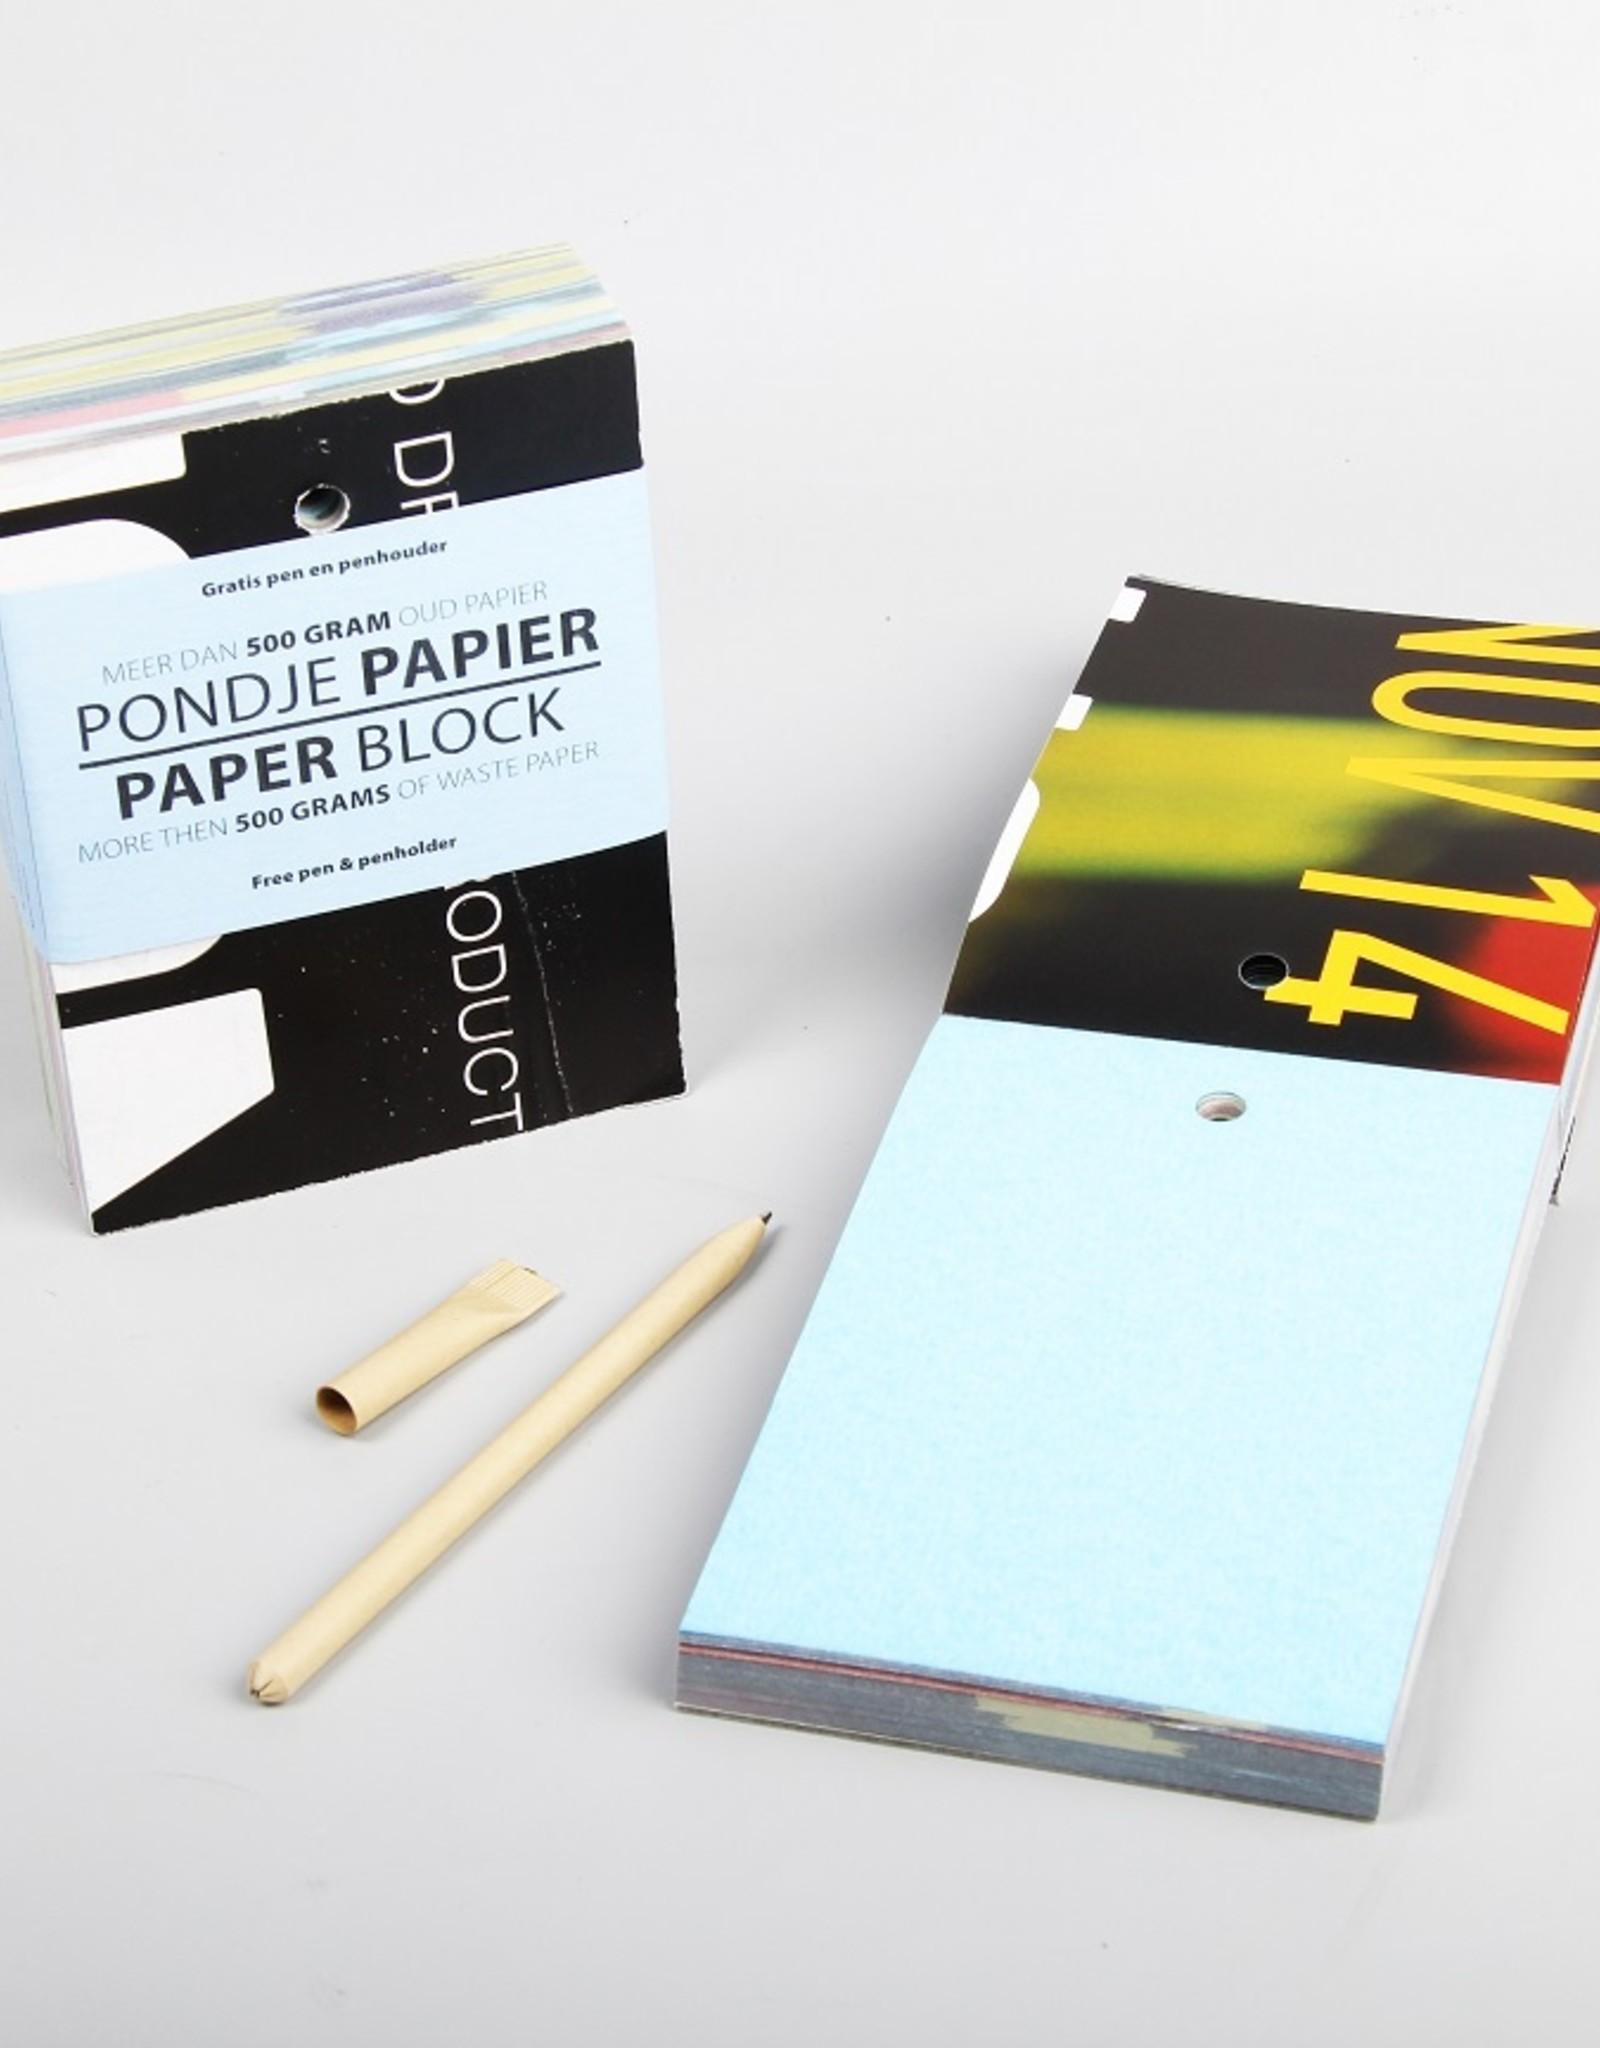 Notitieblokje - Pondje papier